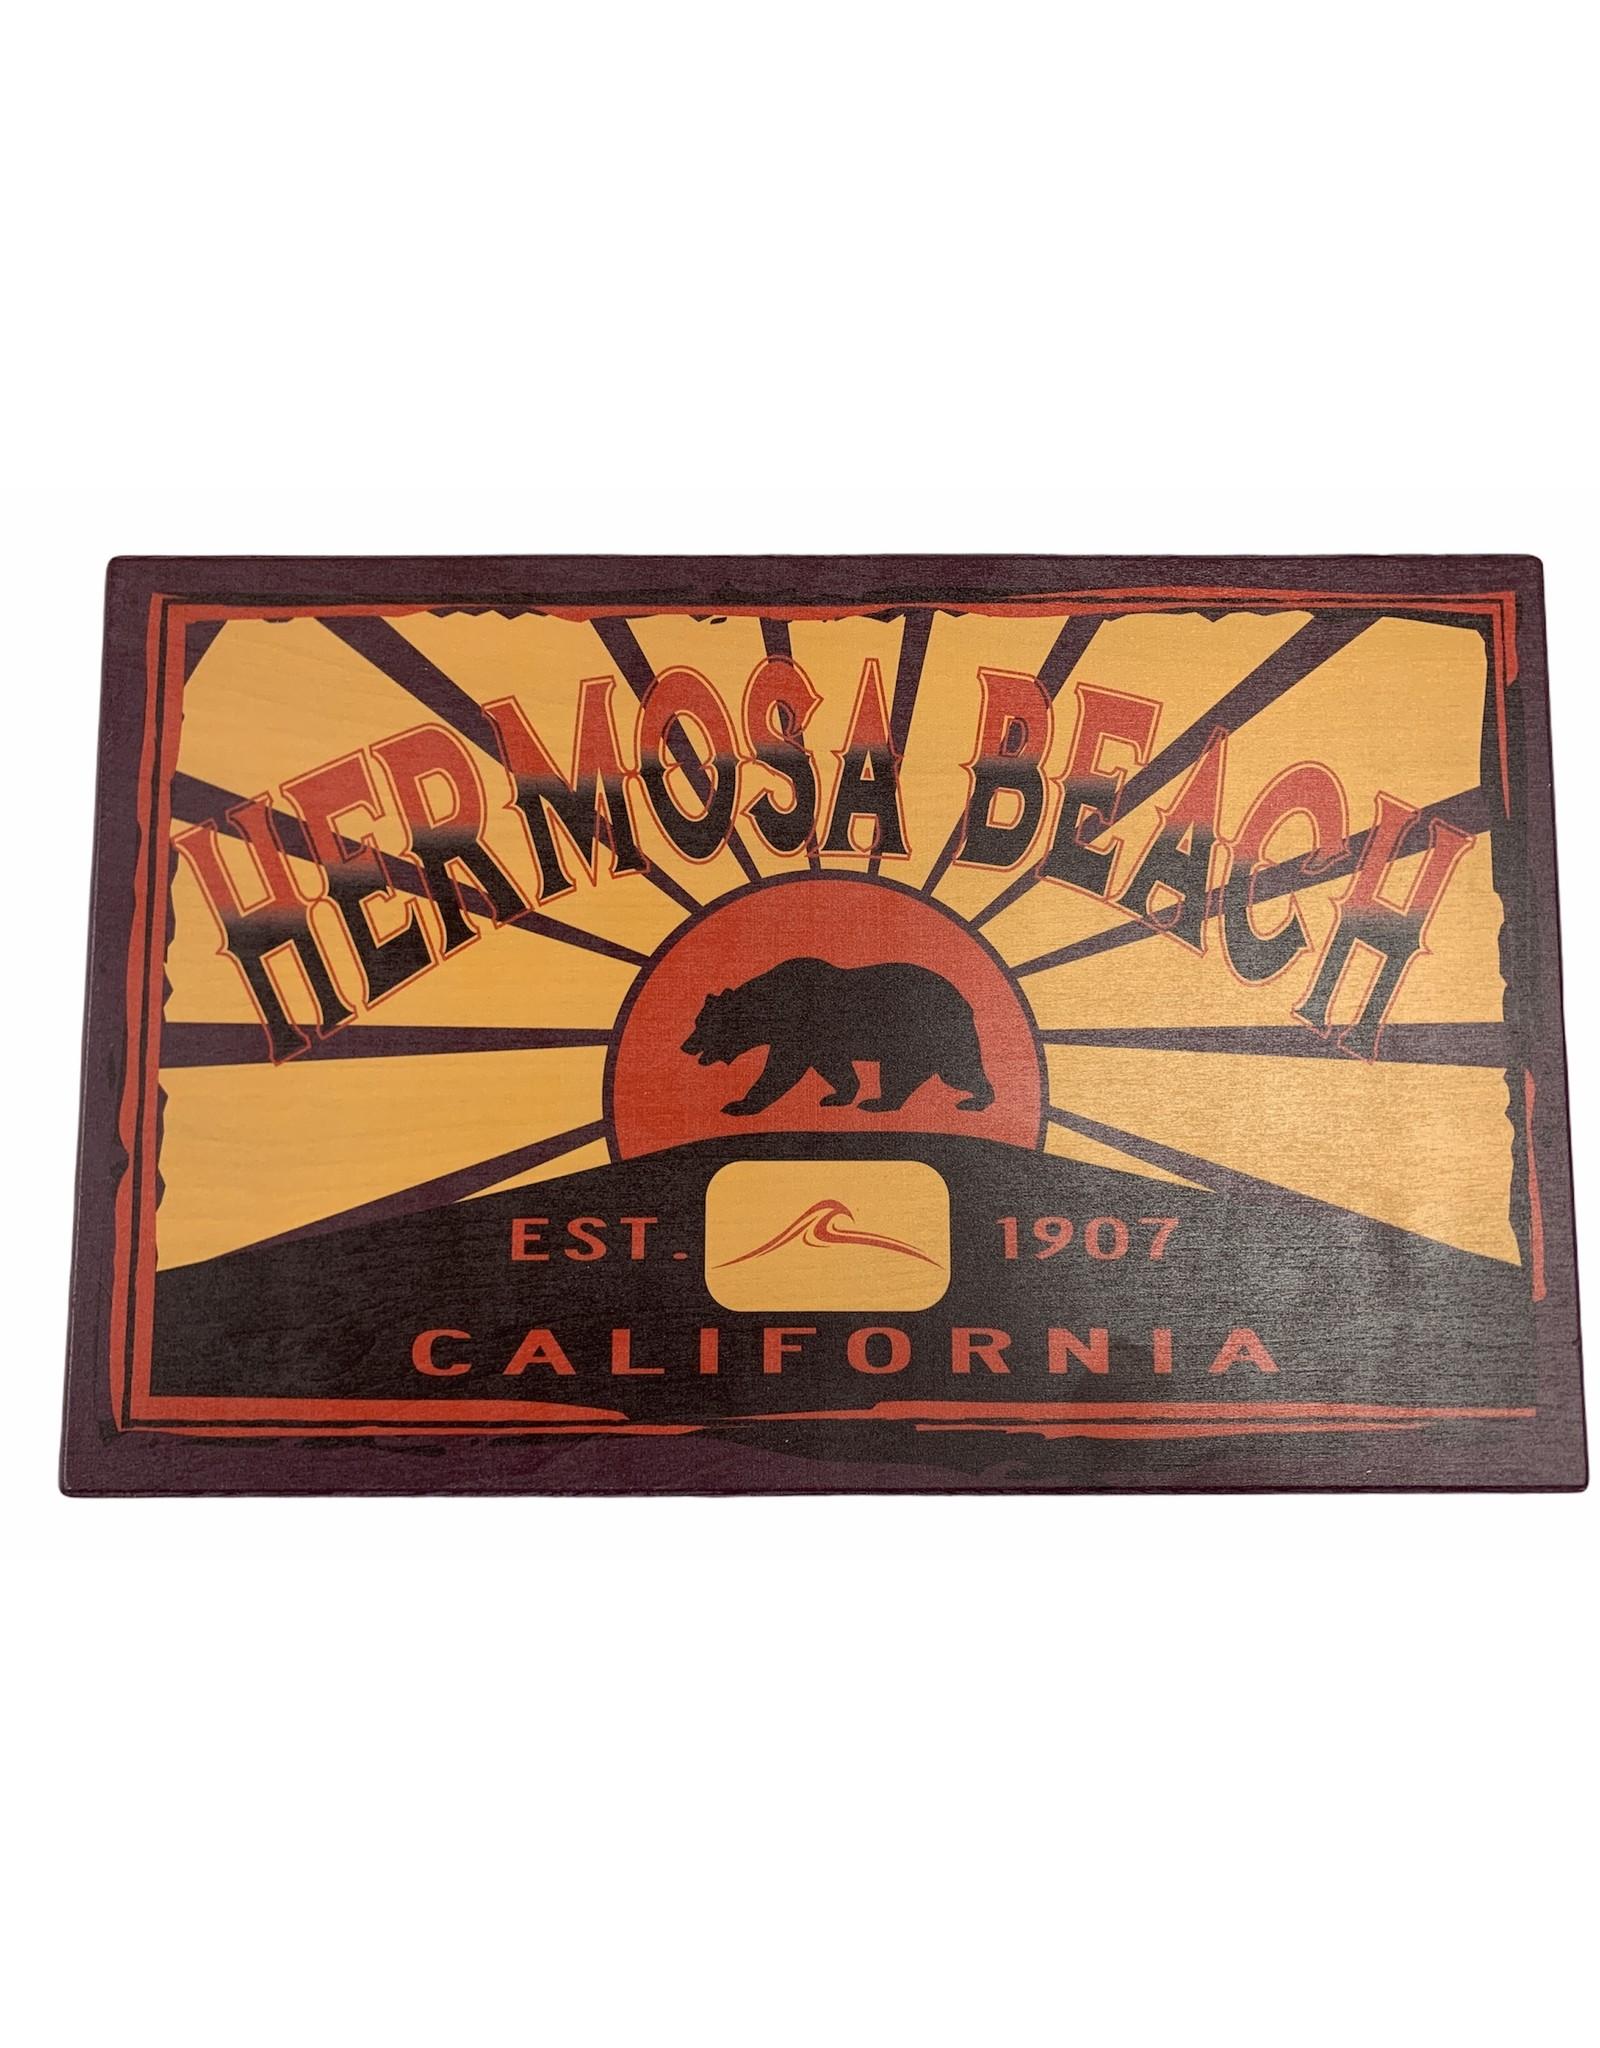 "Blue 84 HB CALI BEAR/WAVE WOOD SIGN 11.5""X18""https://treasure-chest-hermosa-beach.shoplightspeed.com/admin/products/paginate?dir=next&offset=11&product_id=37072070"